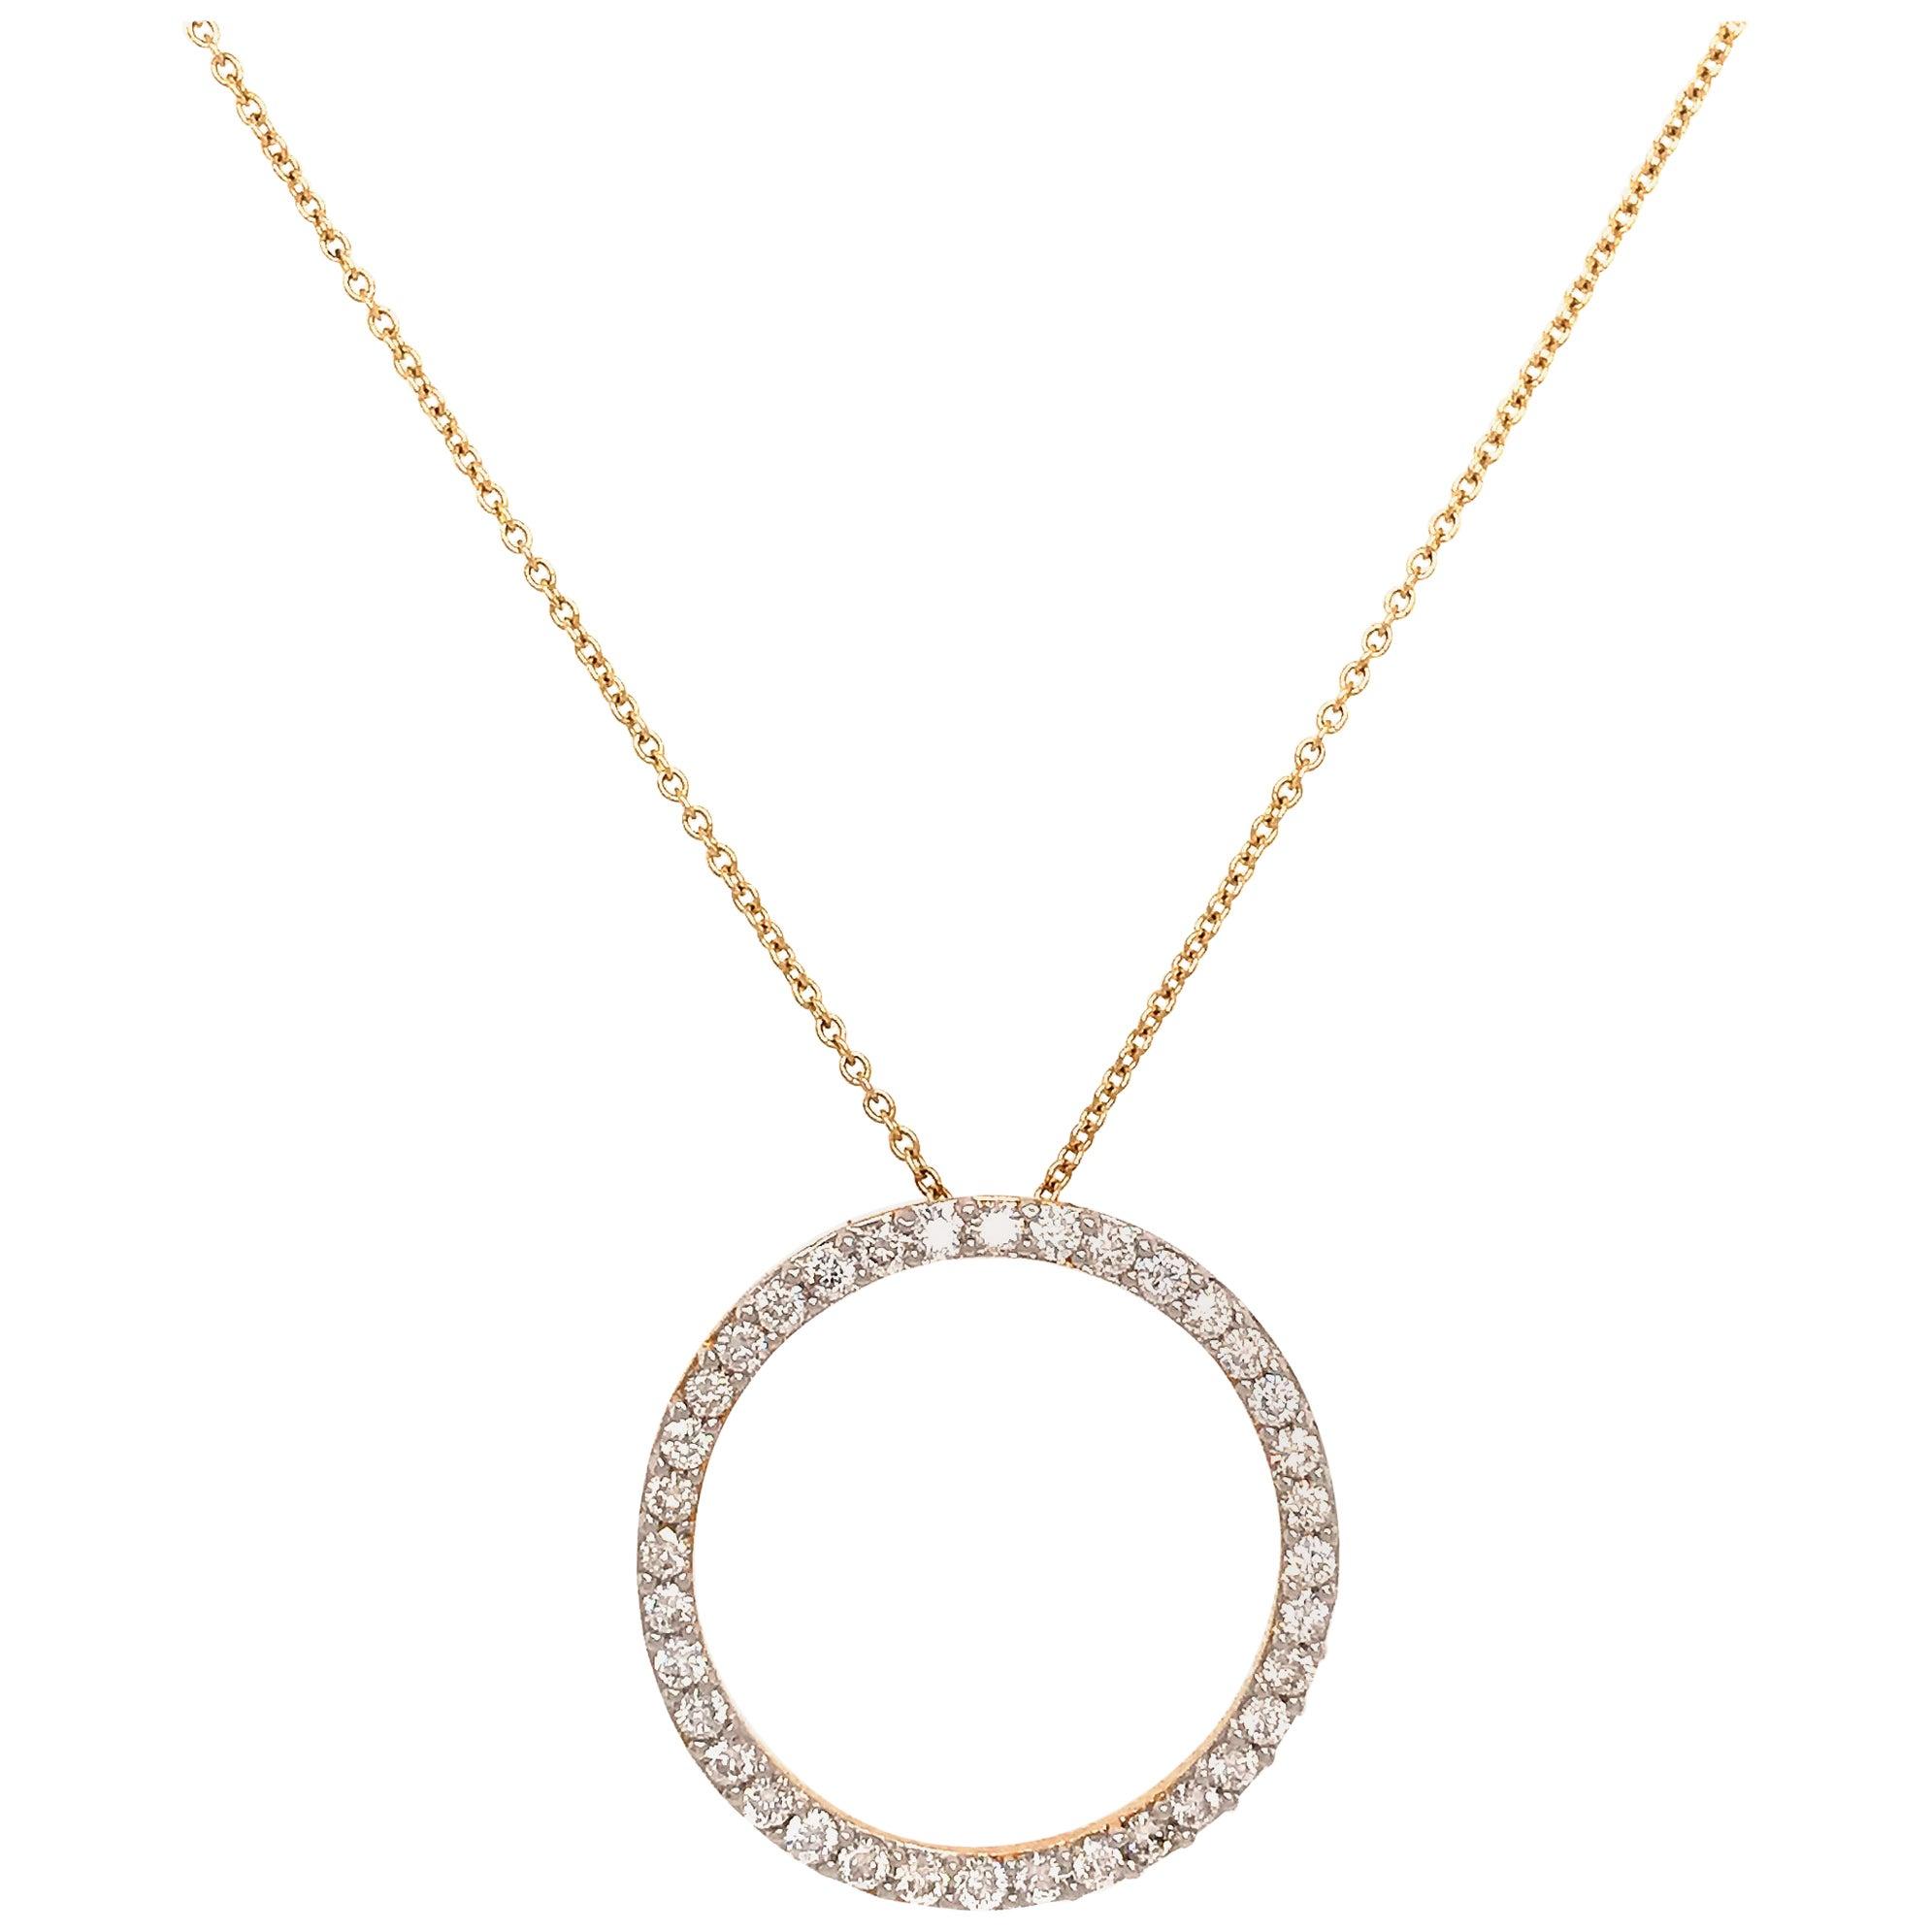 Contemporary 14 Karat Yellow Gold Circle Diamond Pendant Necklace